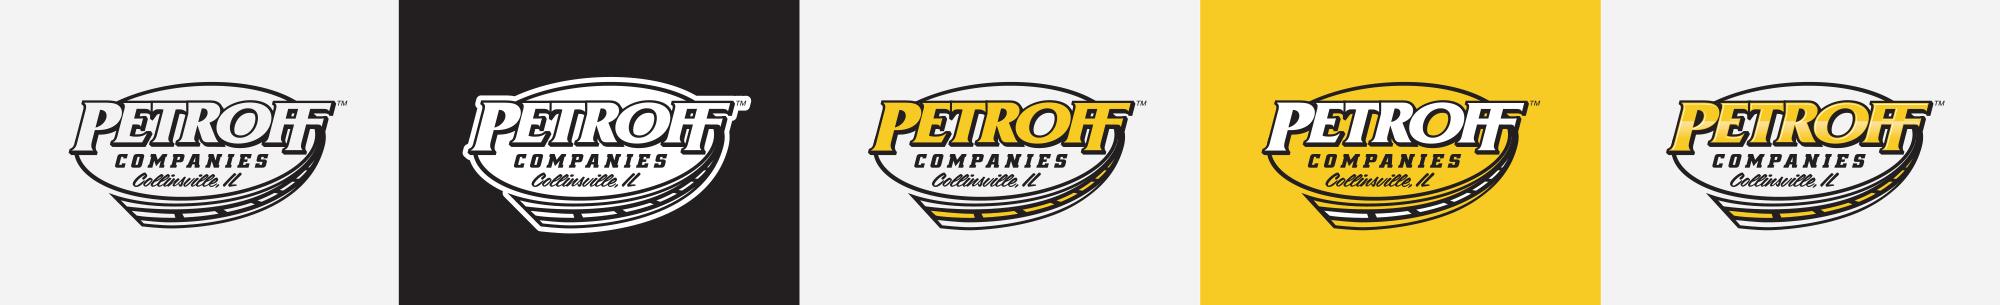 Petroff Companies logo deliverables